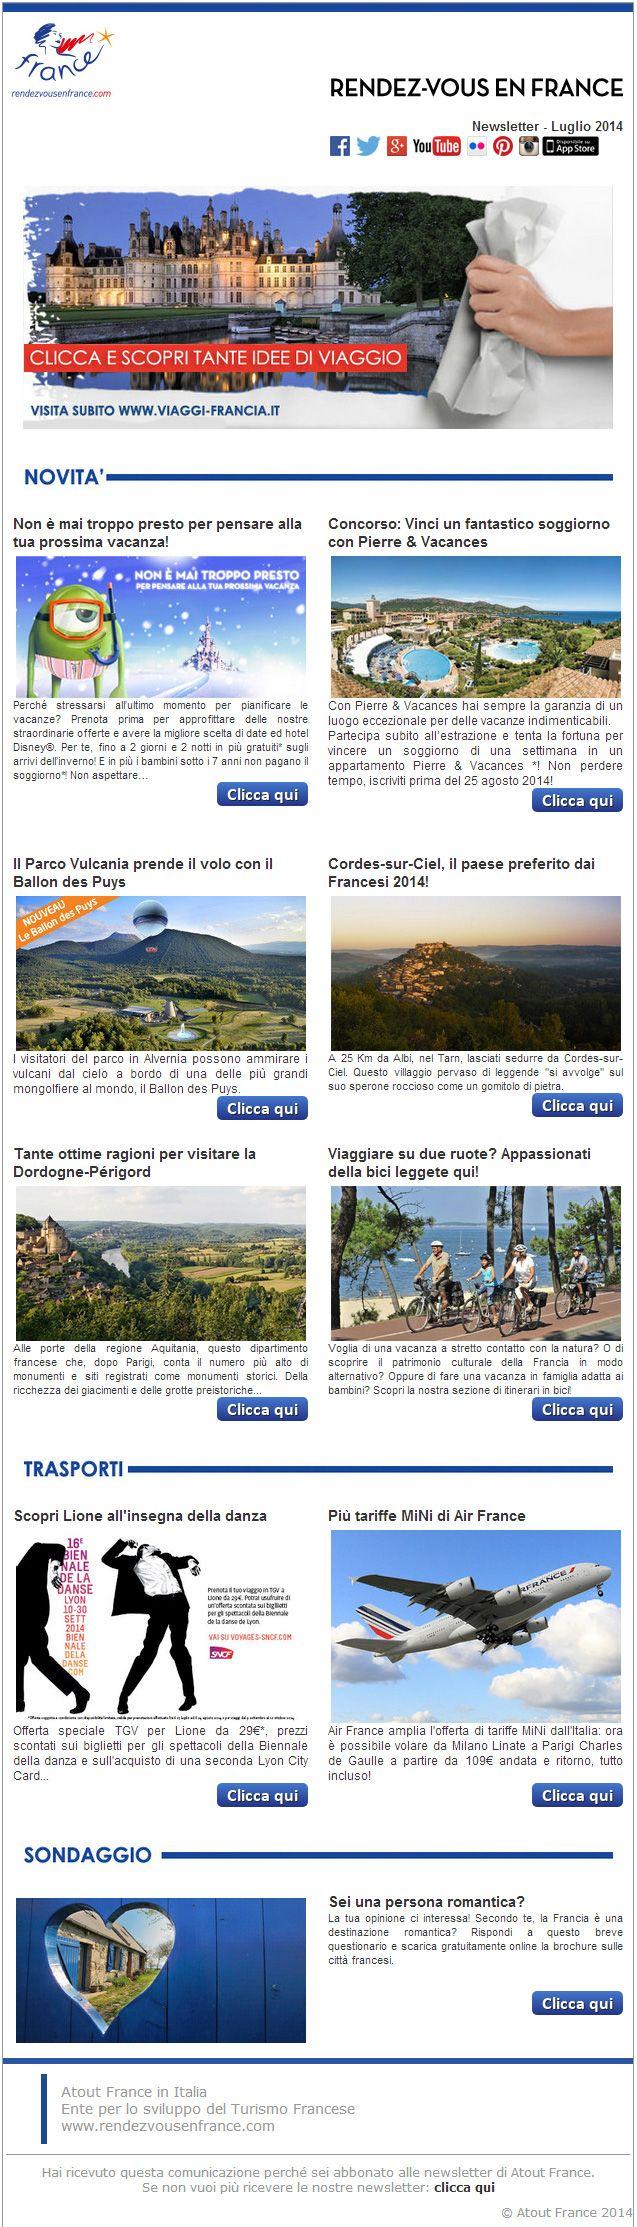 30 best Le nostre newsletter images on Pinterest | Website, Party ...